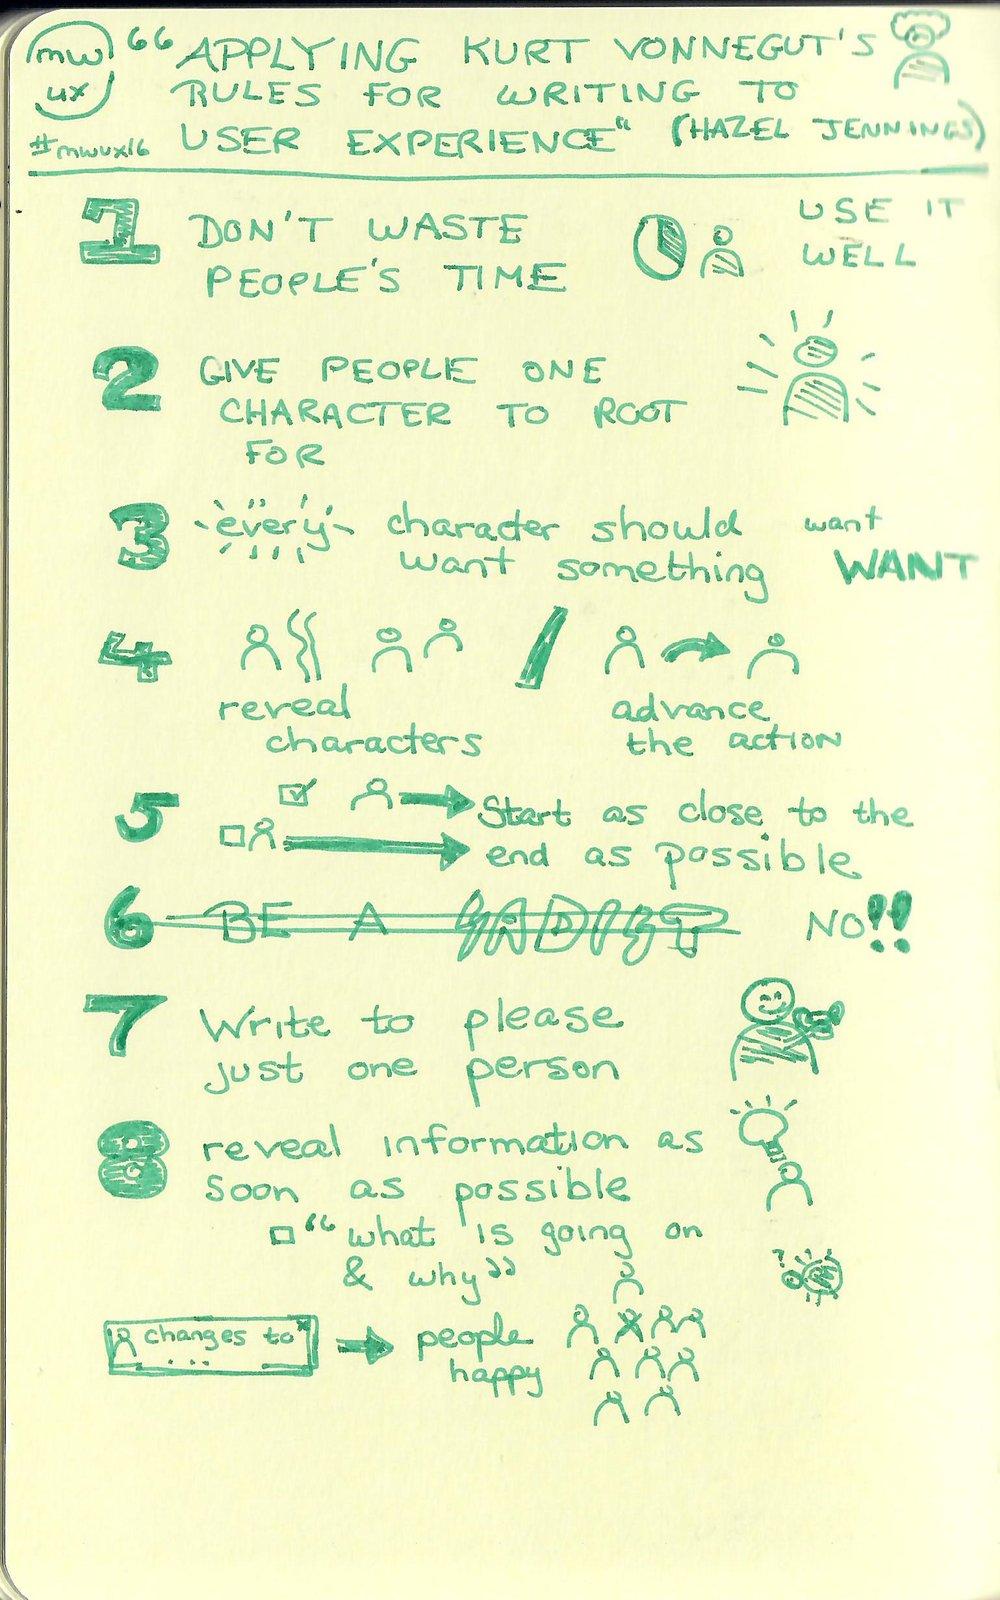 Kurt Vonneguts Rules for Writing (Hazel Jenning).jpg